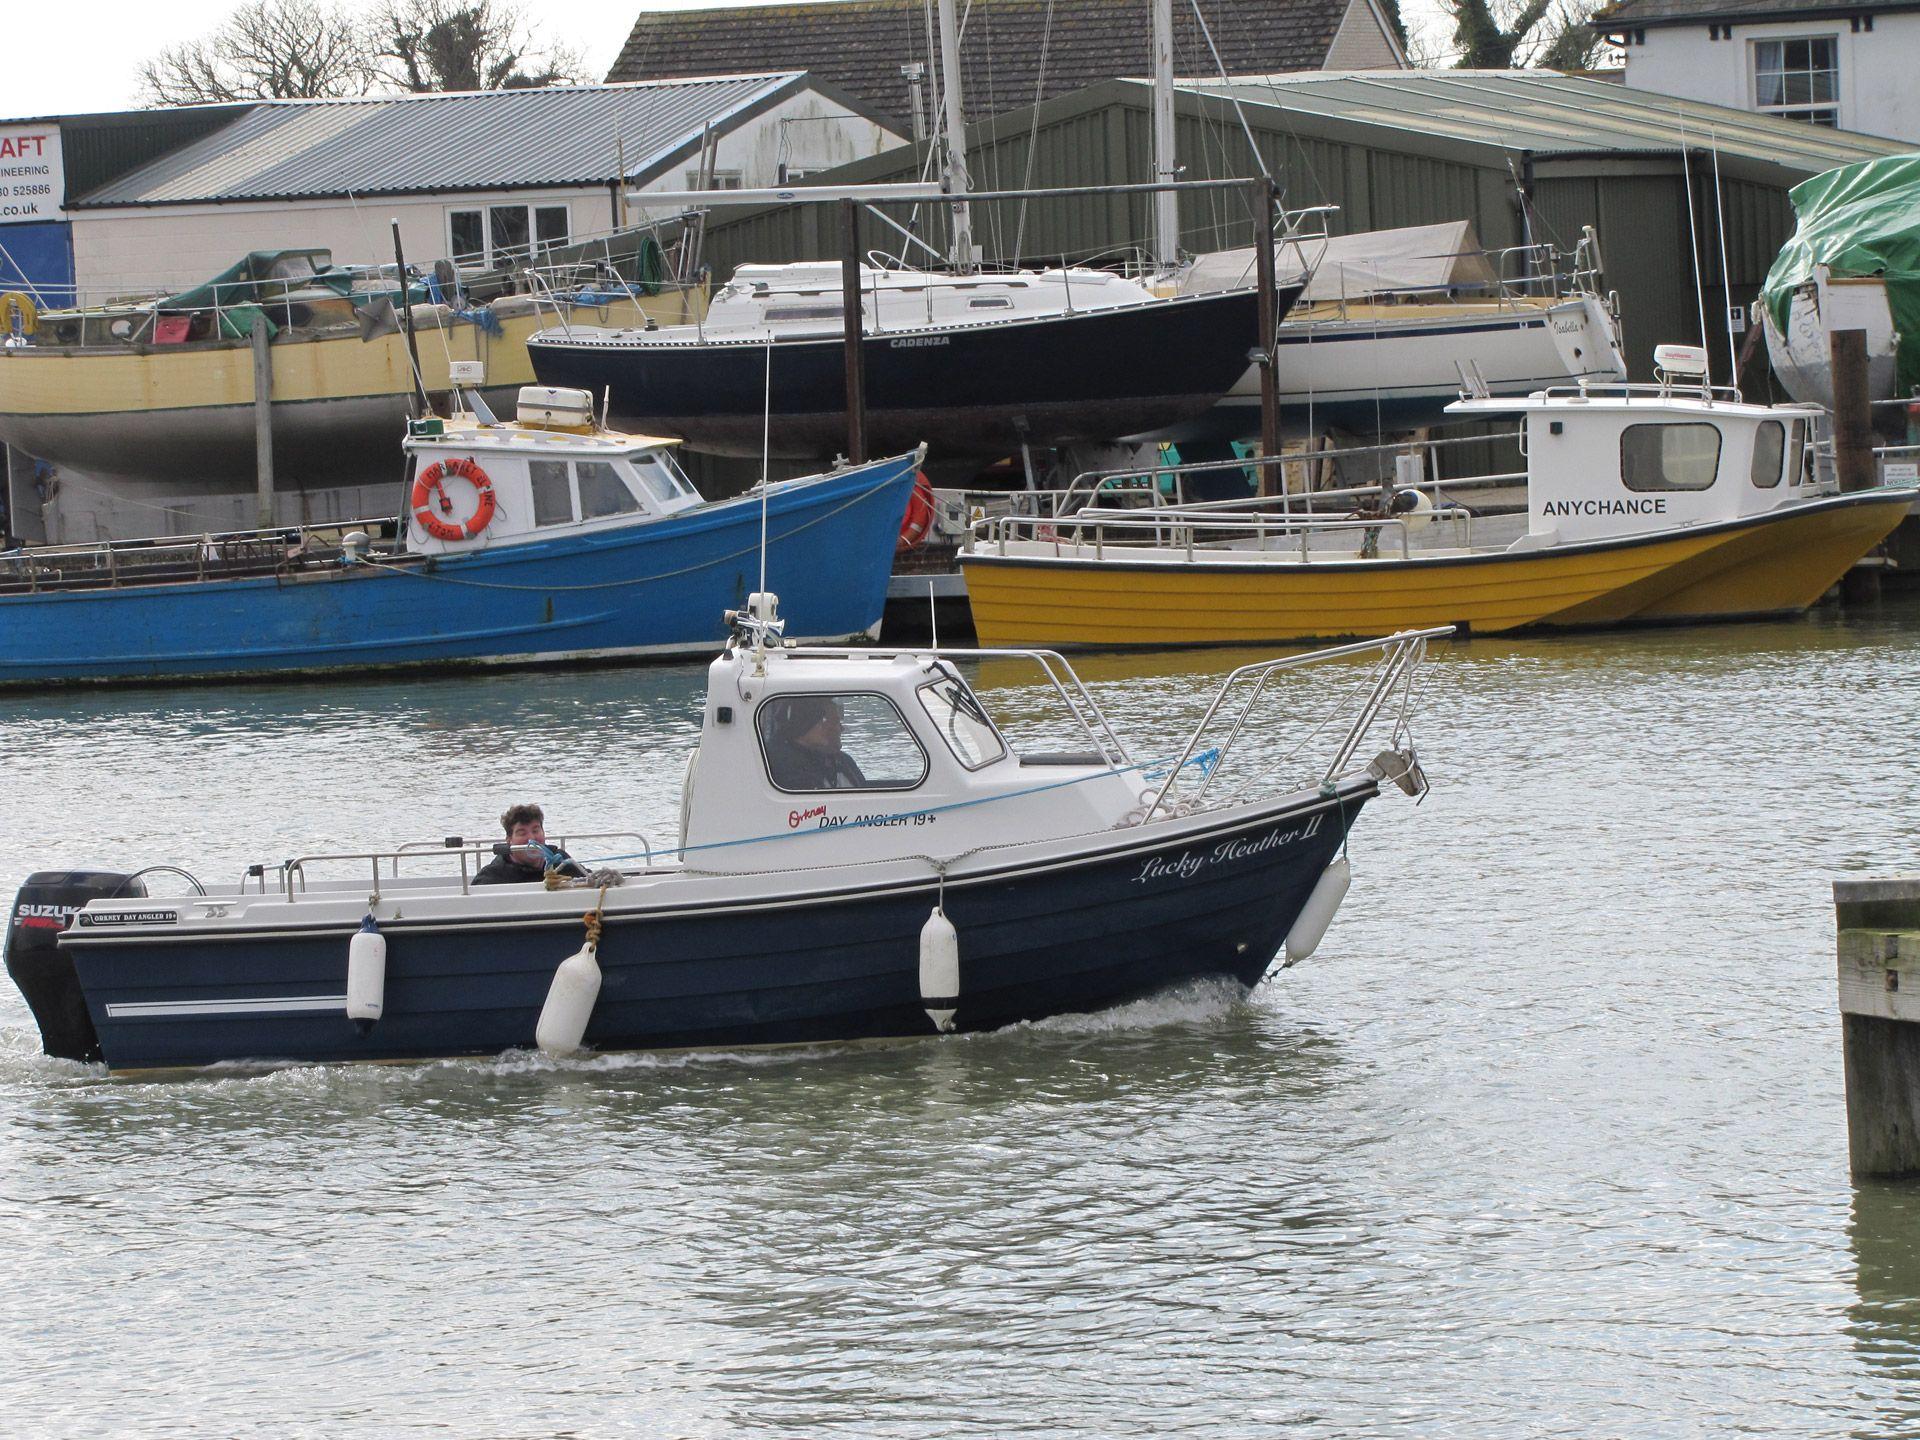 Small Fishing Boat Free Stock Photo Hd Public Domain Pictures Small Fishing Boats Boat Fishing Boats